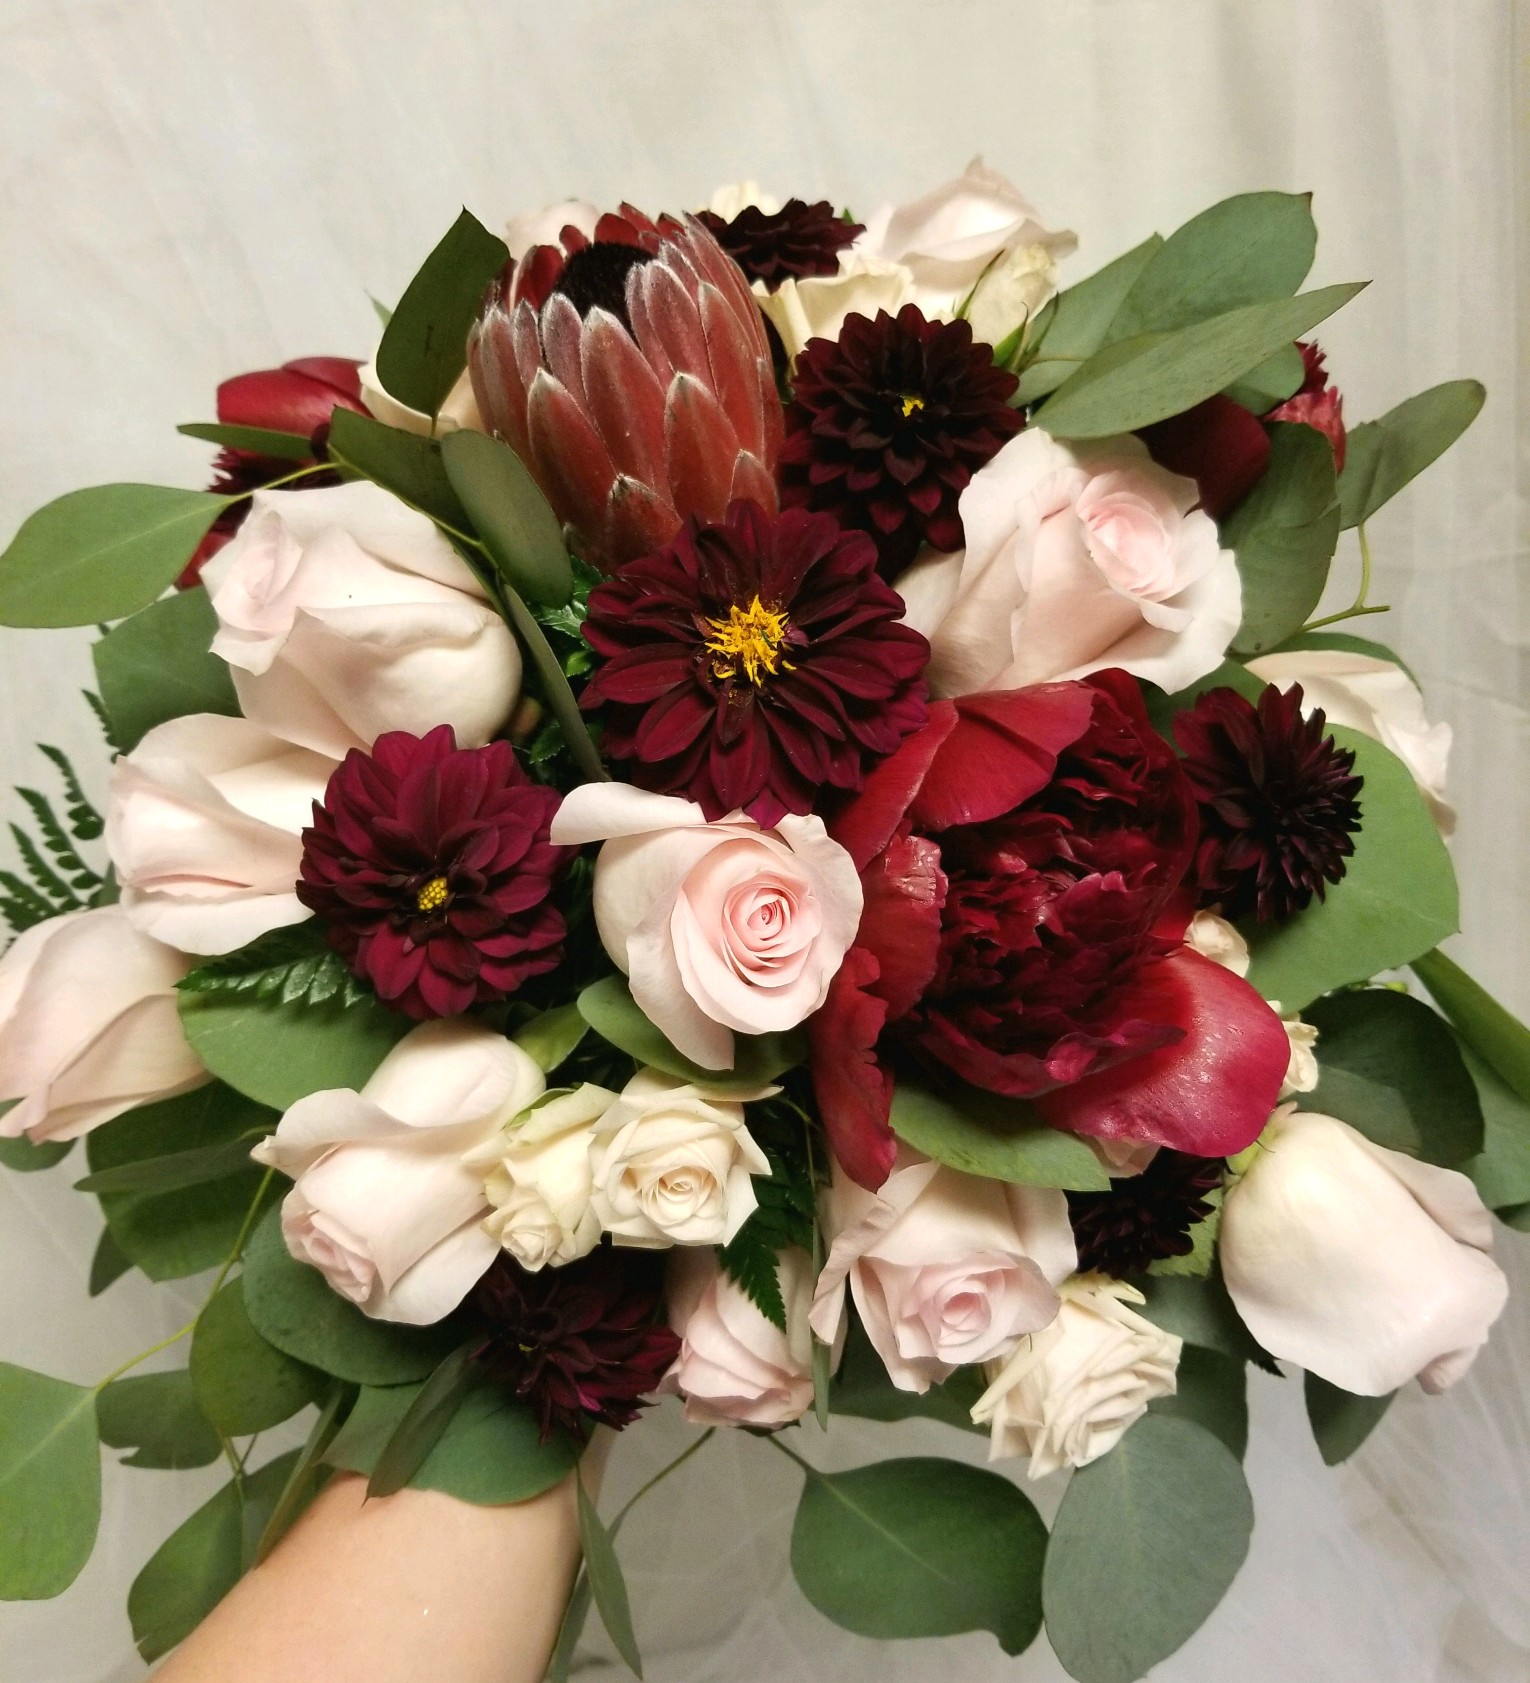 Cossairt Florist & Greenhouse